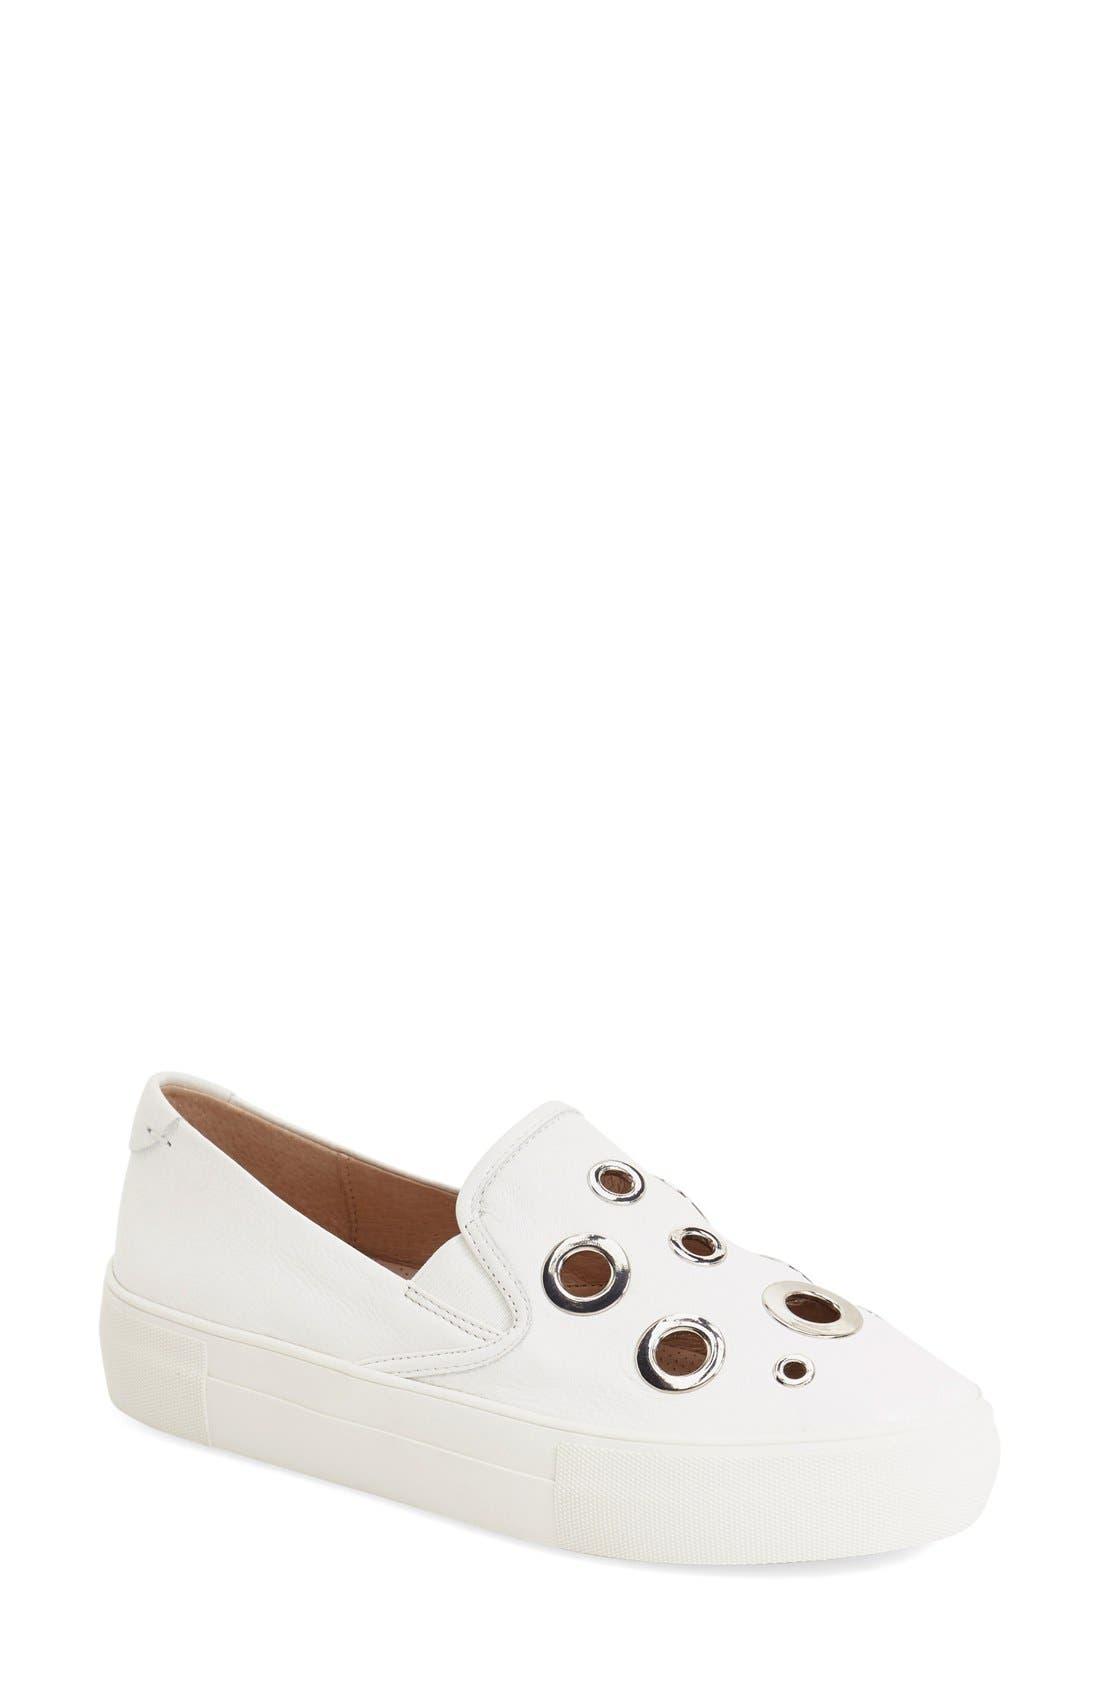 Main Image - JSlides 'A-List' Slip-On Platform Sneaker (Women)